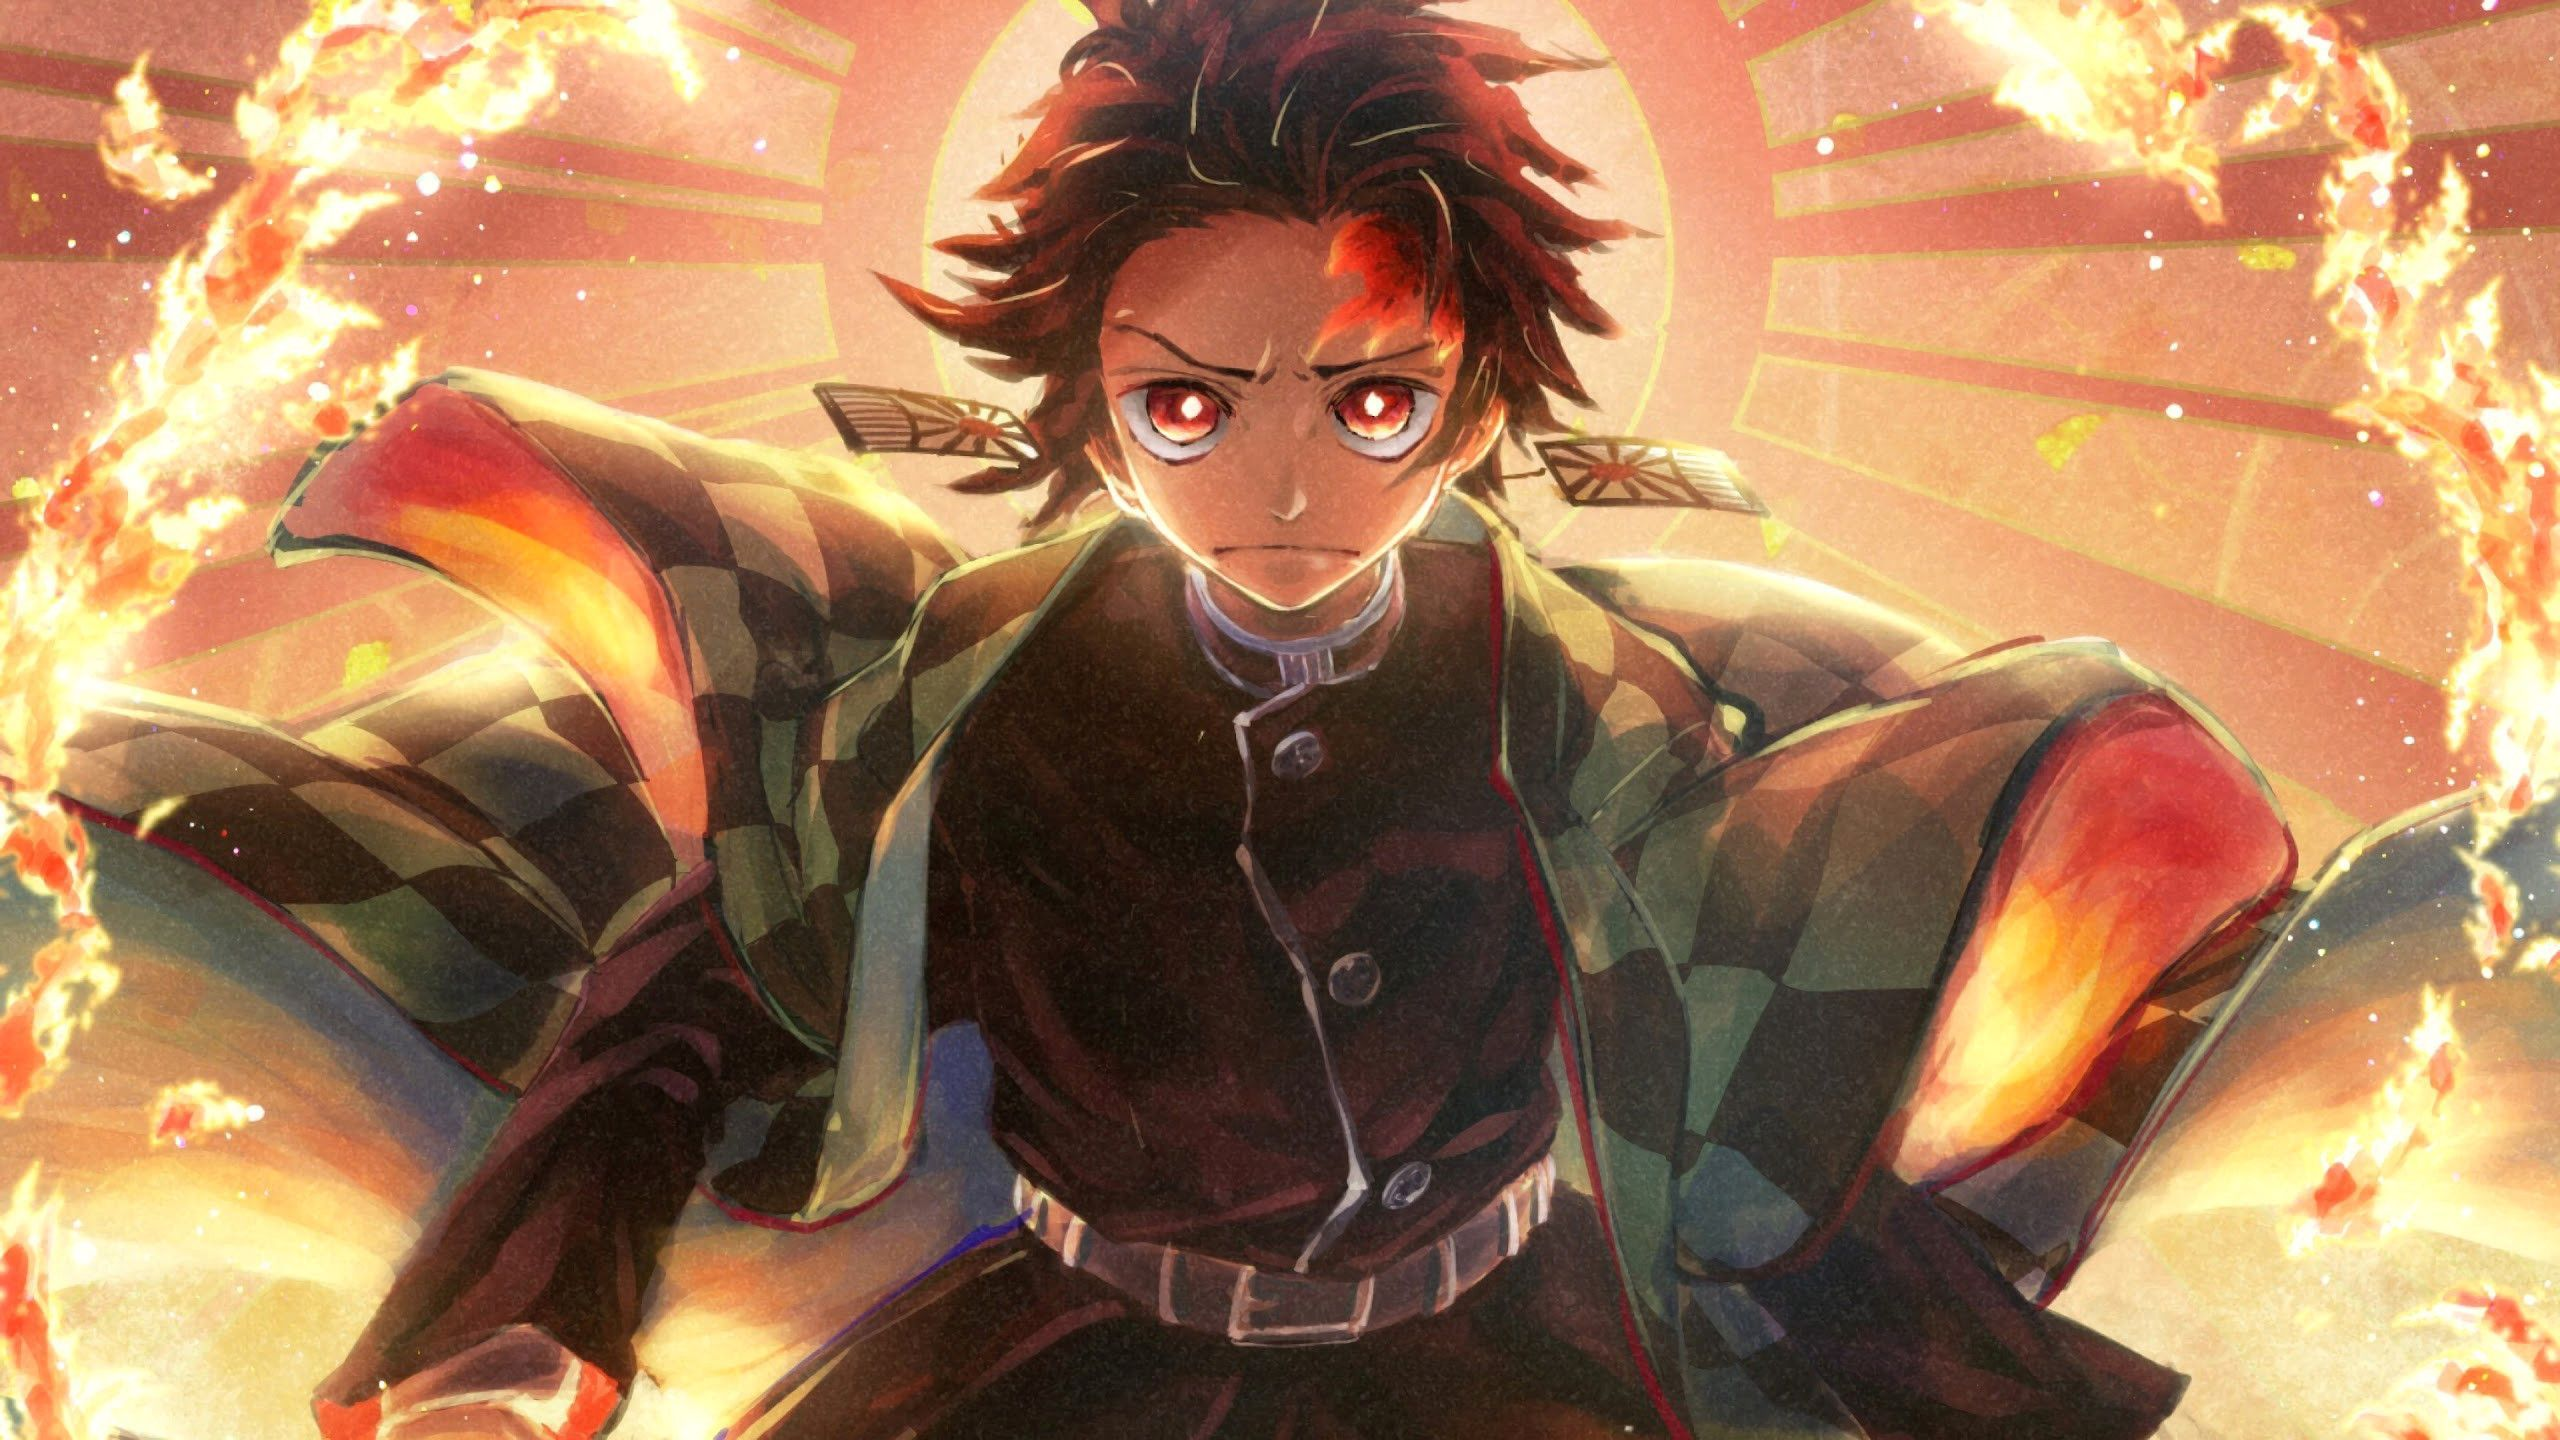 Demon Slayer Kimetsu No Yaiba 4k Wallpapers In 2021 Anime Wallpaper Hd Anime Wallpapers Anime